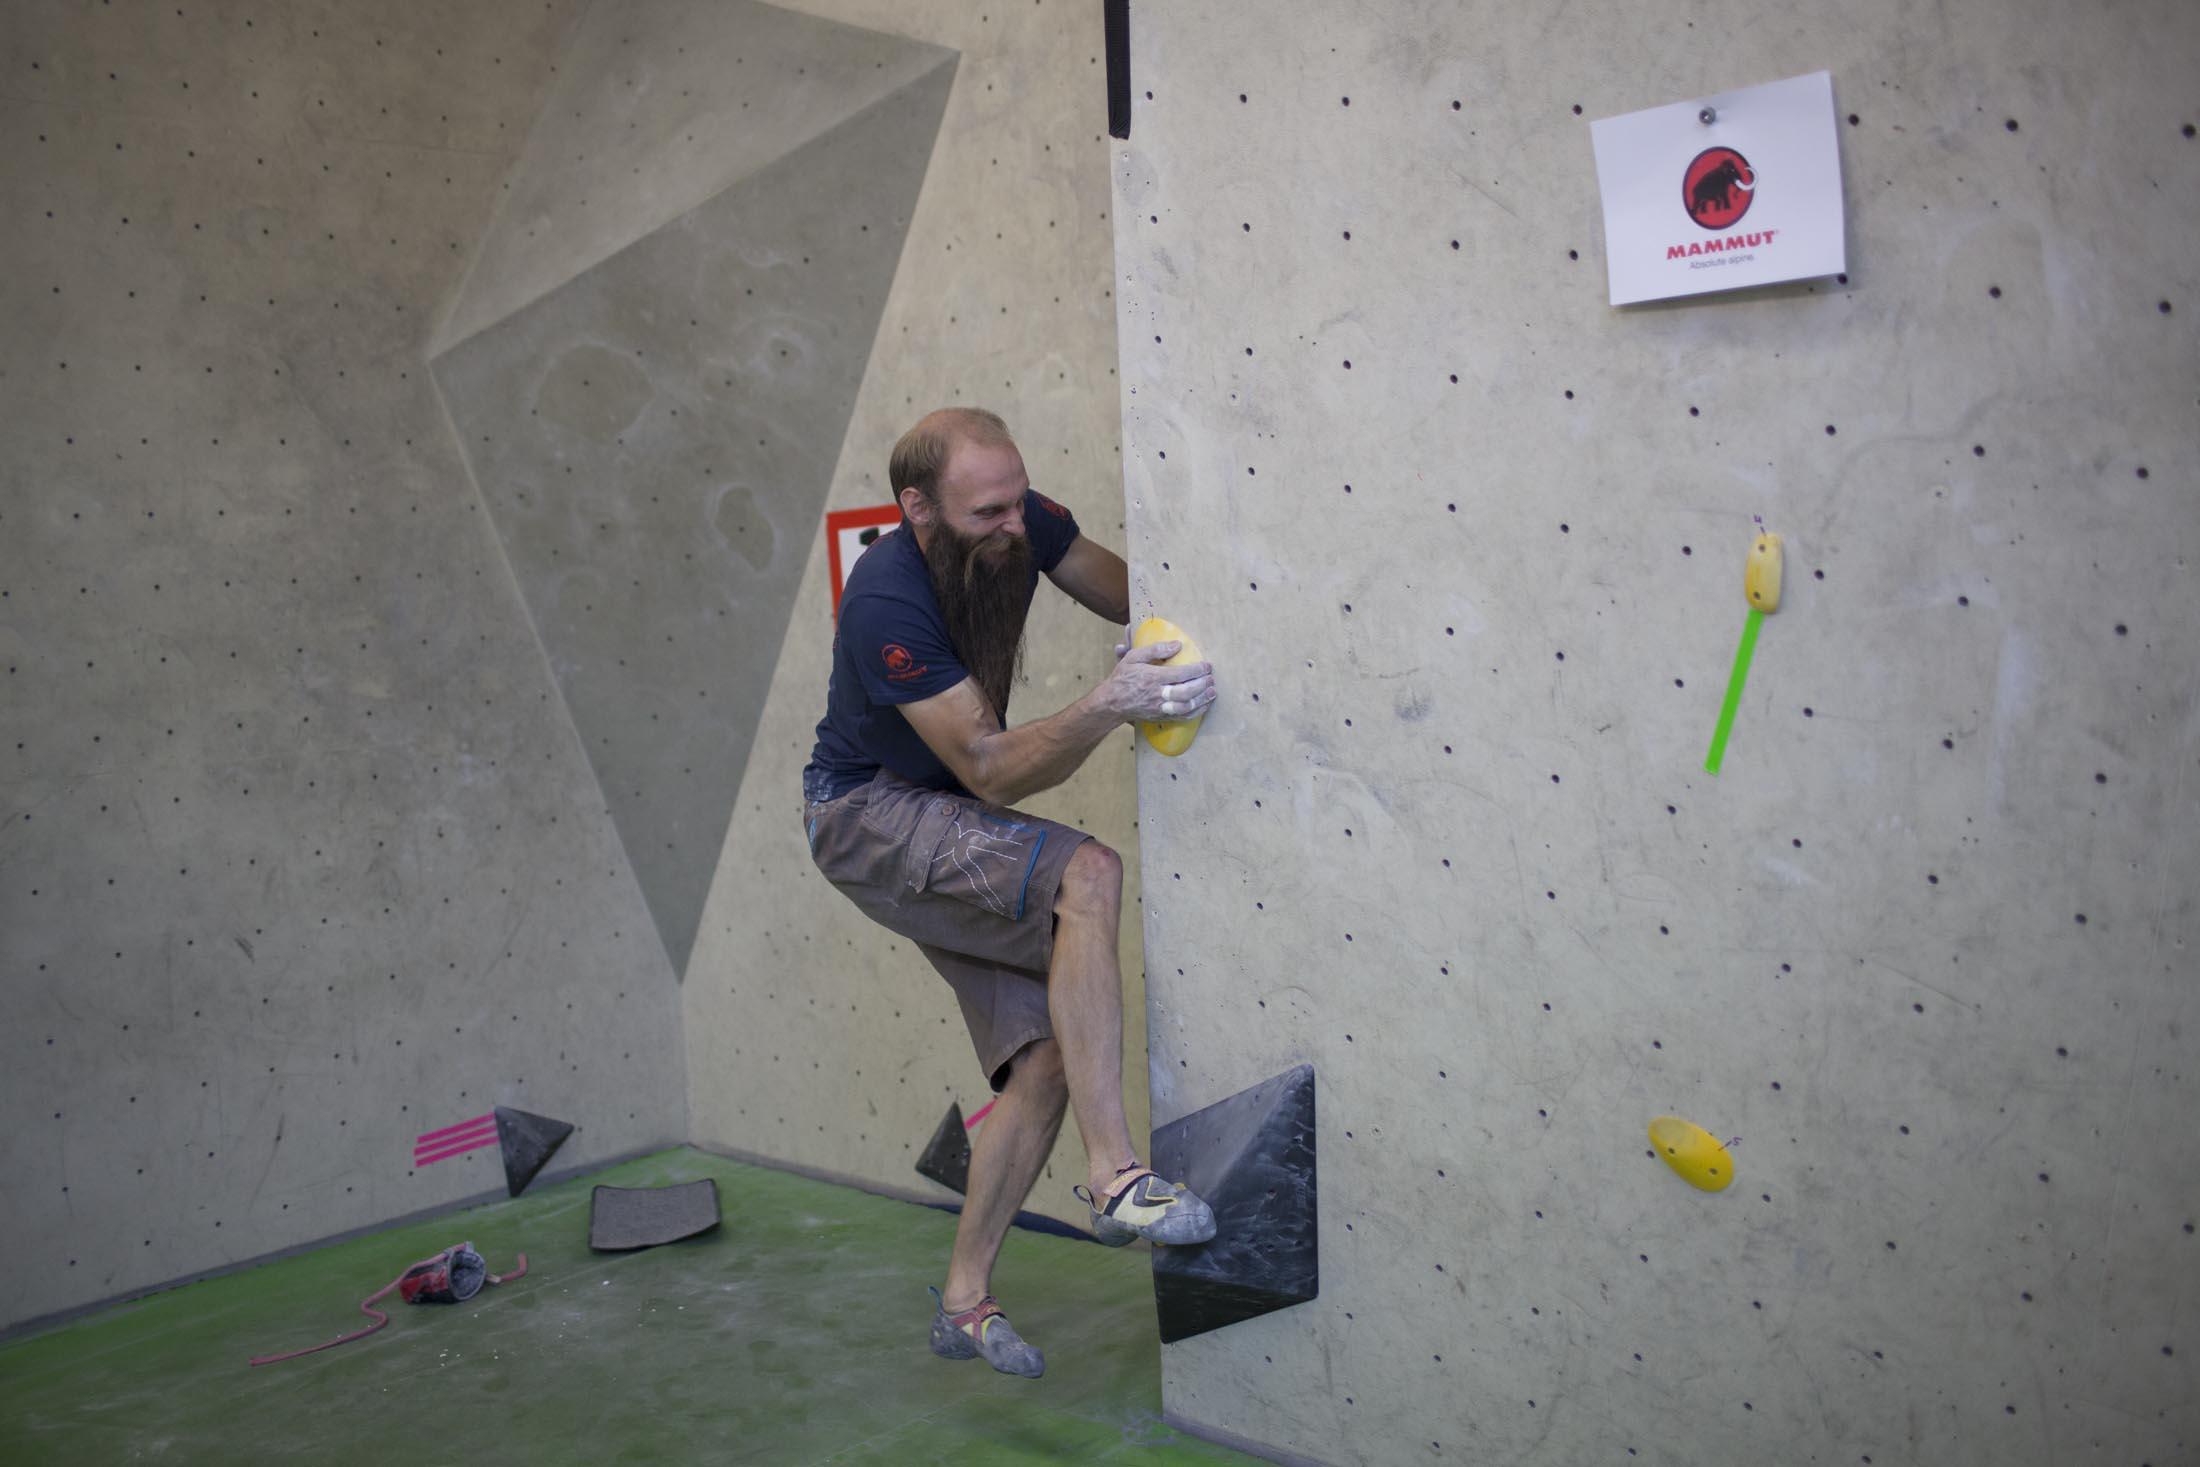 Finale, internationaler bouldercup Frankenjura 2016, BLOCKHELDEN Erlangen, Mammut, Bergfreunde.de, Boulderwettkampf07092016487